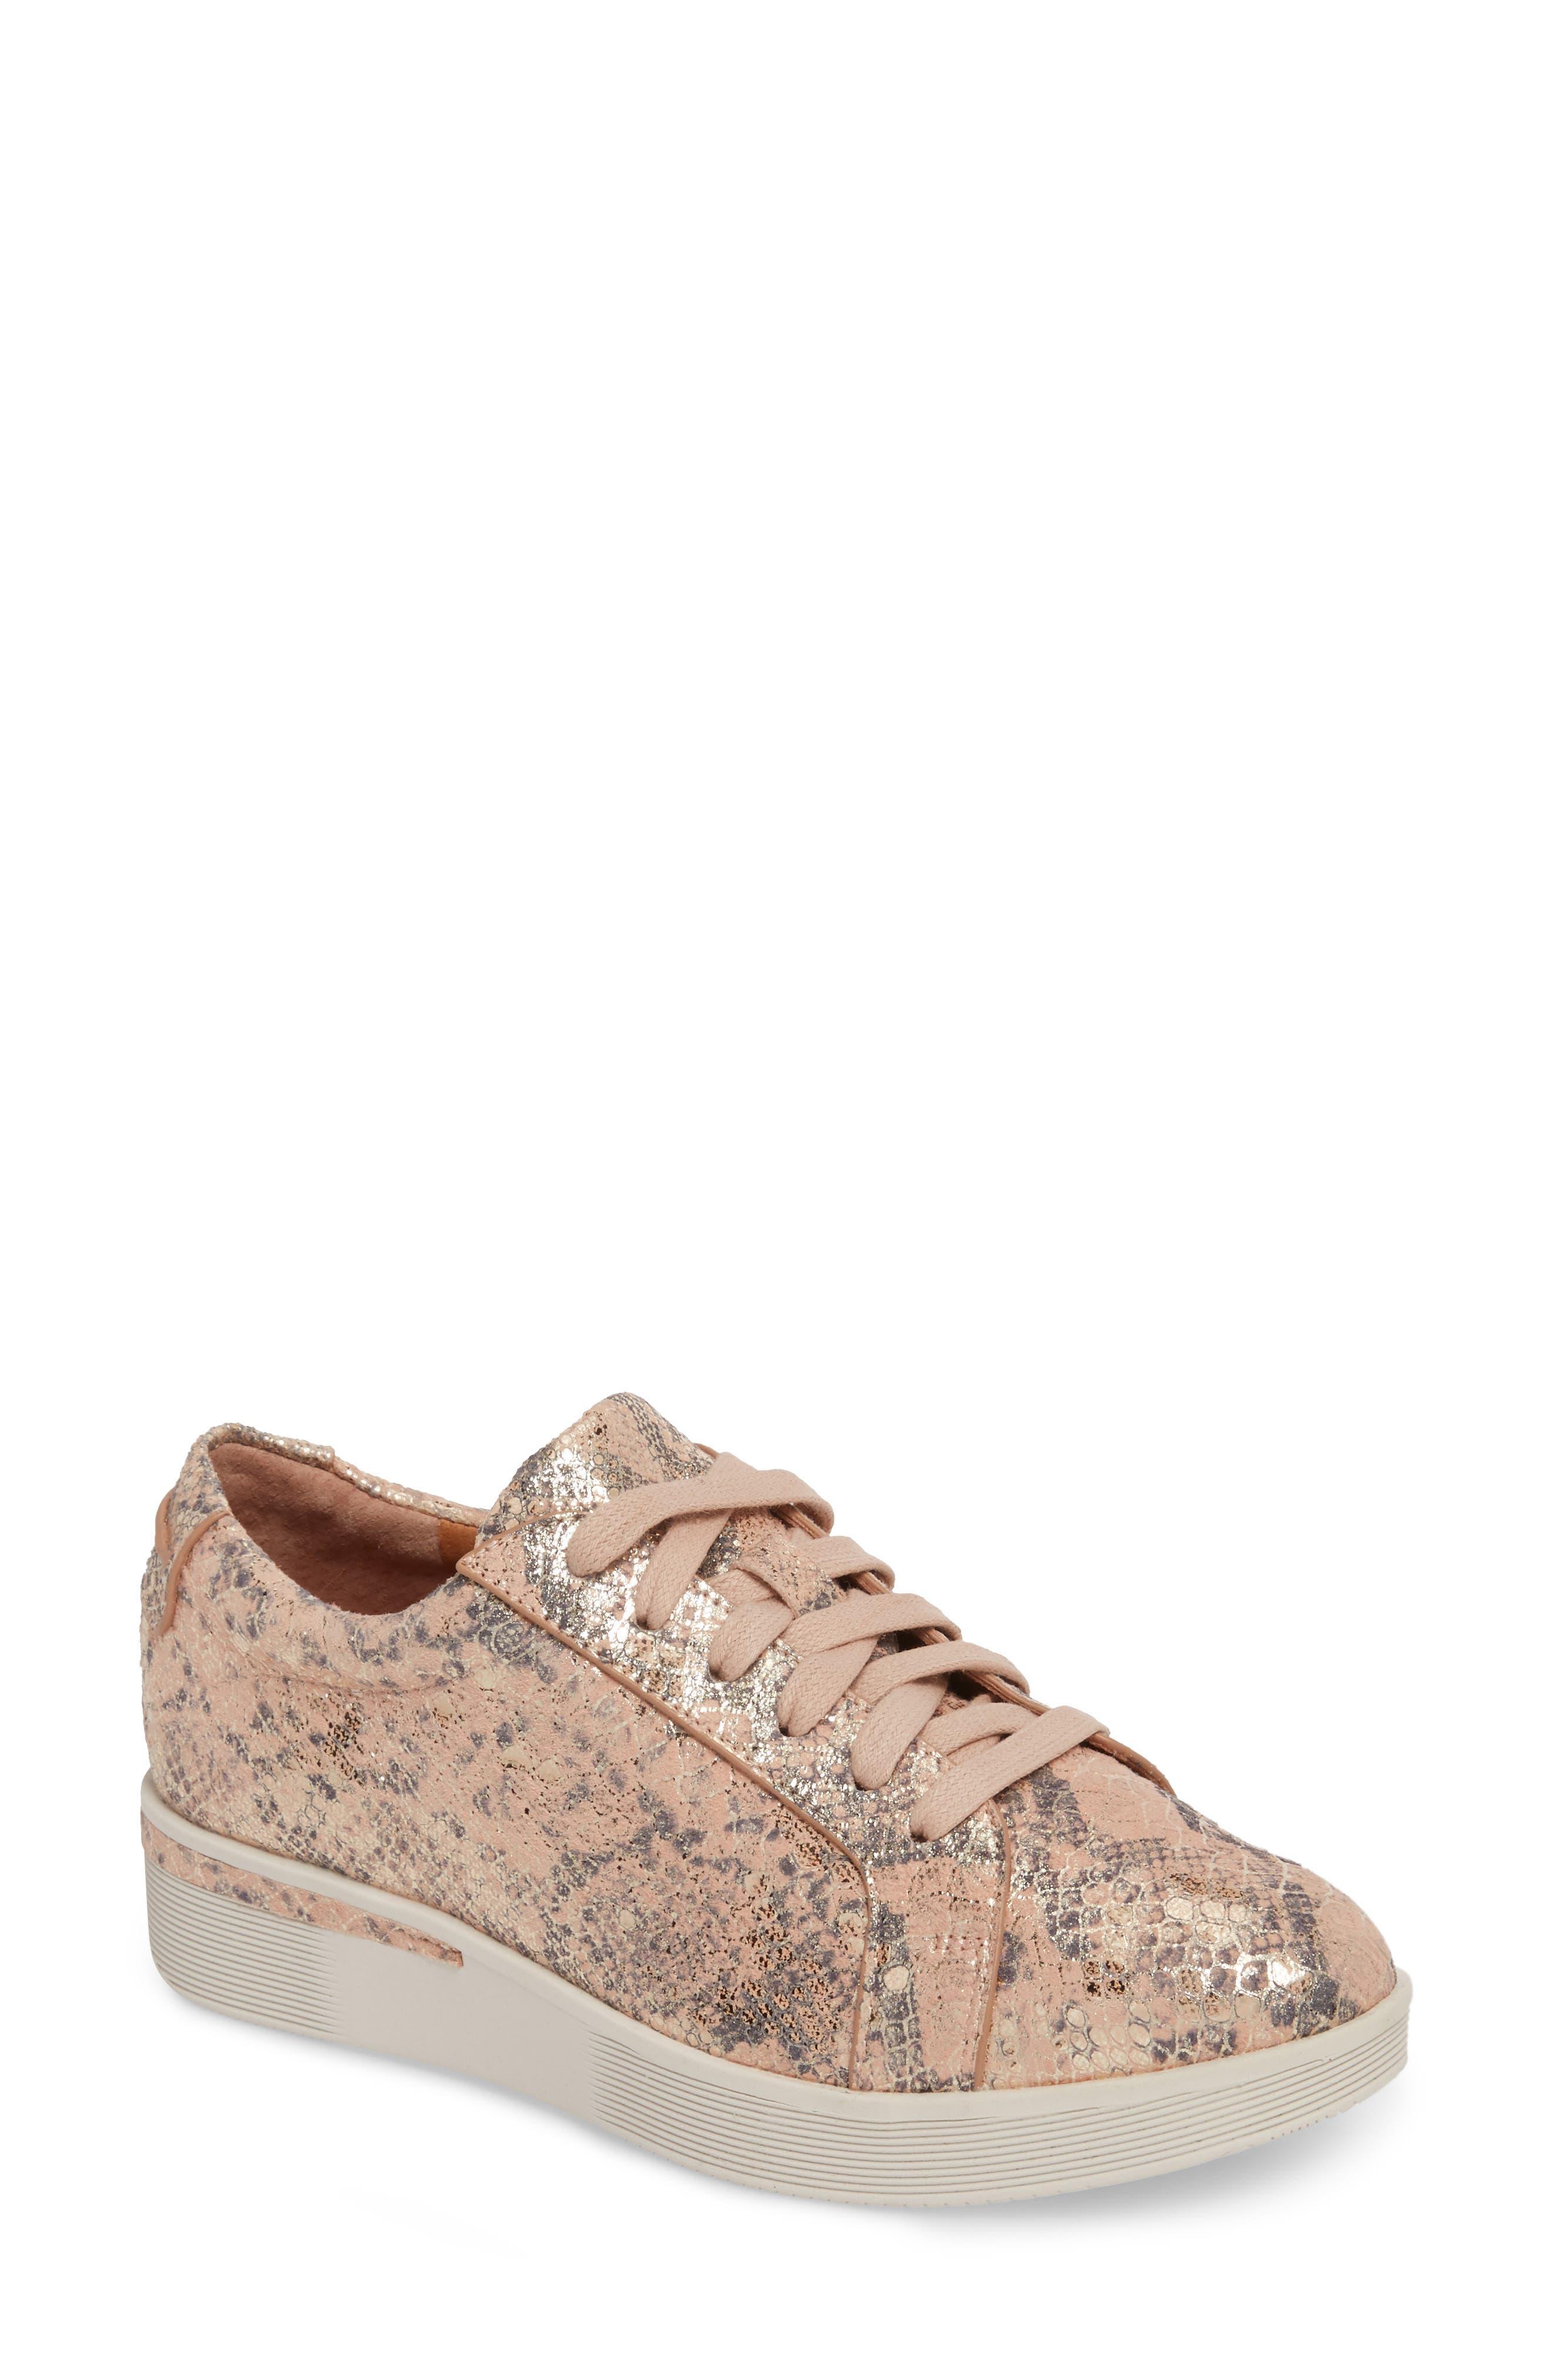 Main Image - Gentle Souls Haddie Low Platform Sneaker (Women)